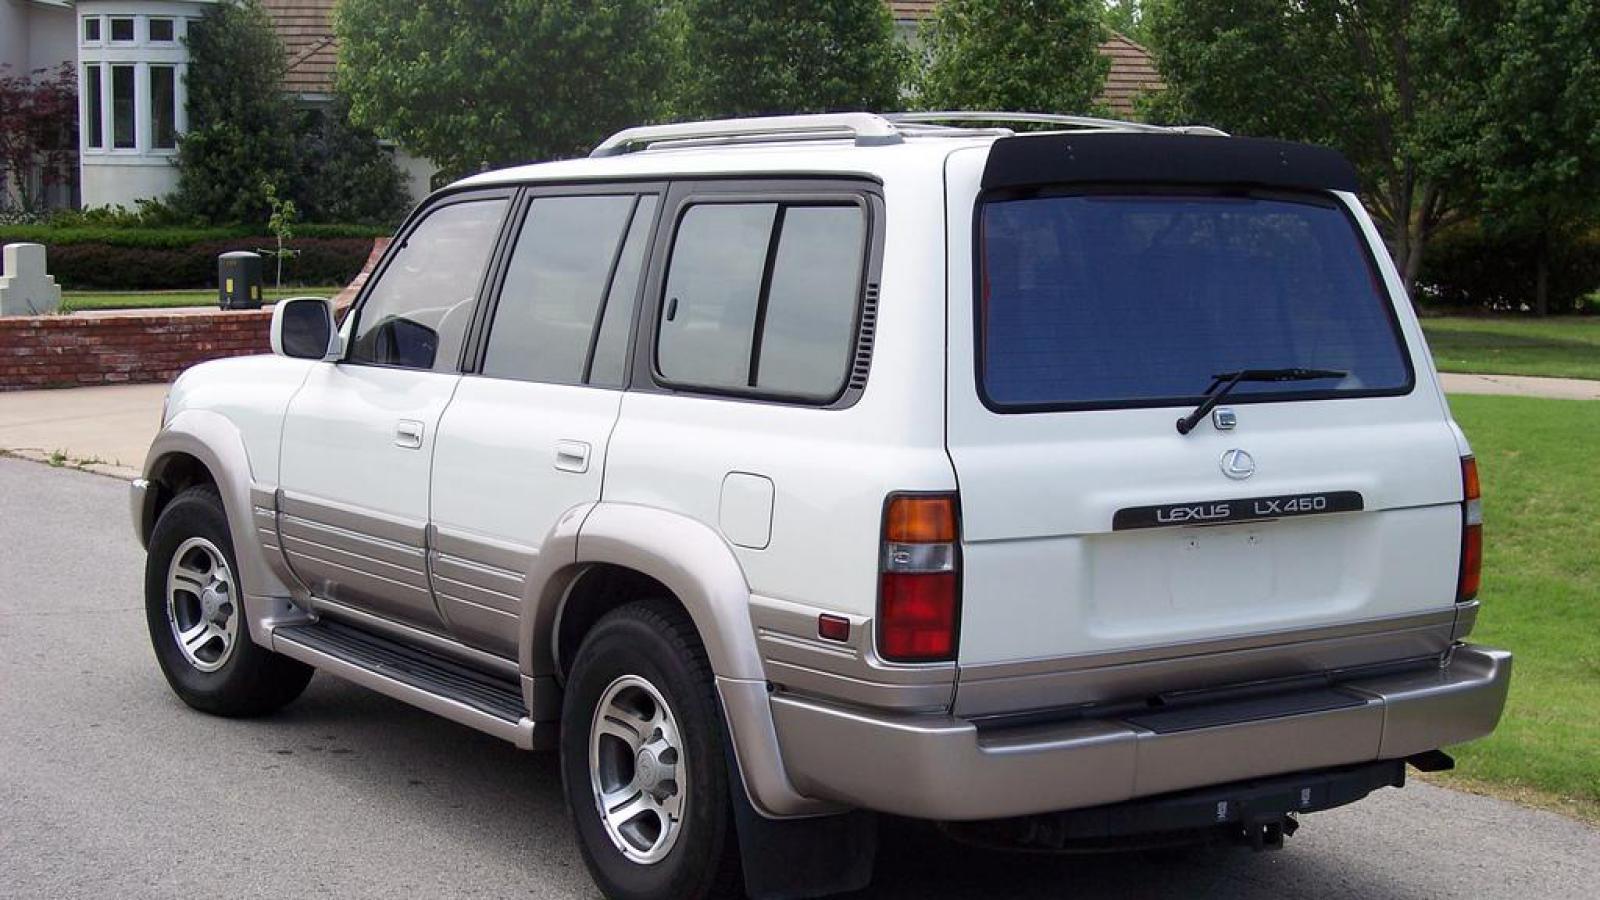 Lexus lx 450 1994 car classifieds software autos classifieds software